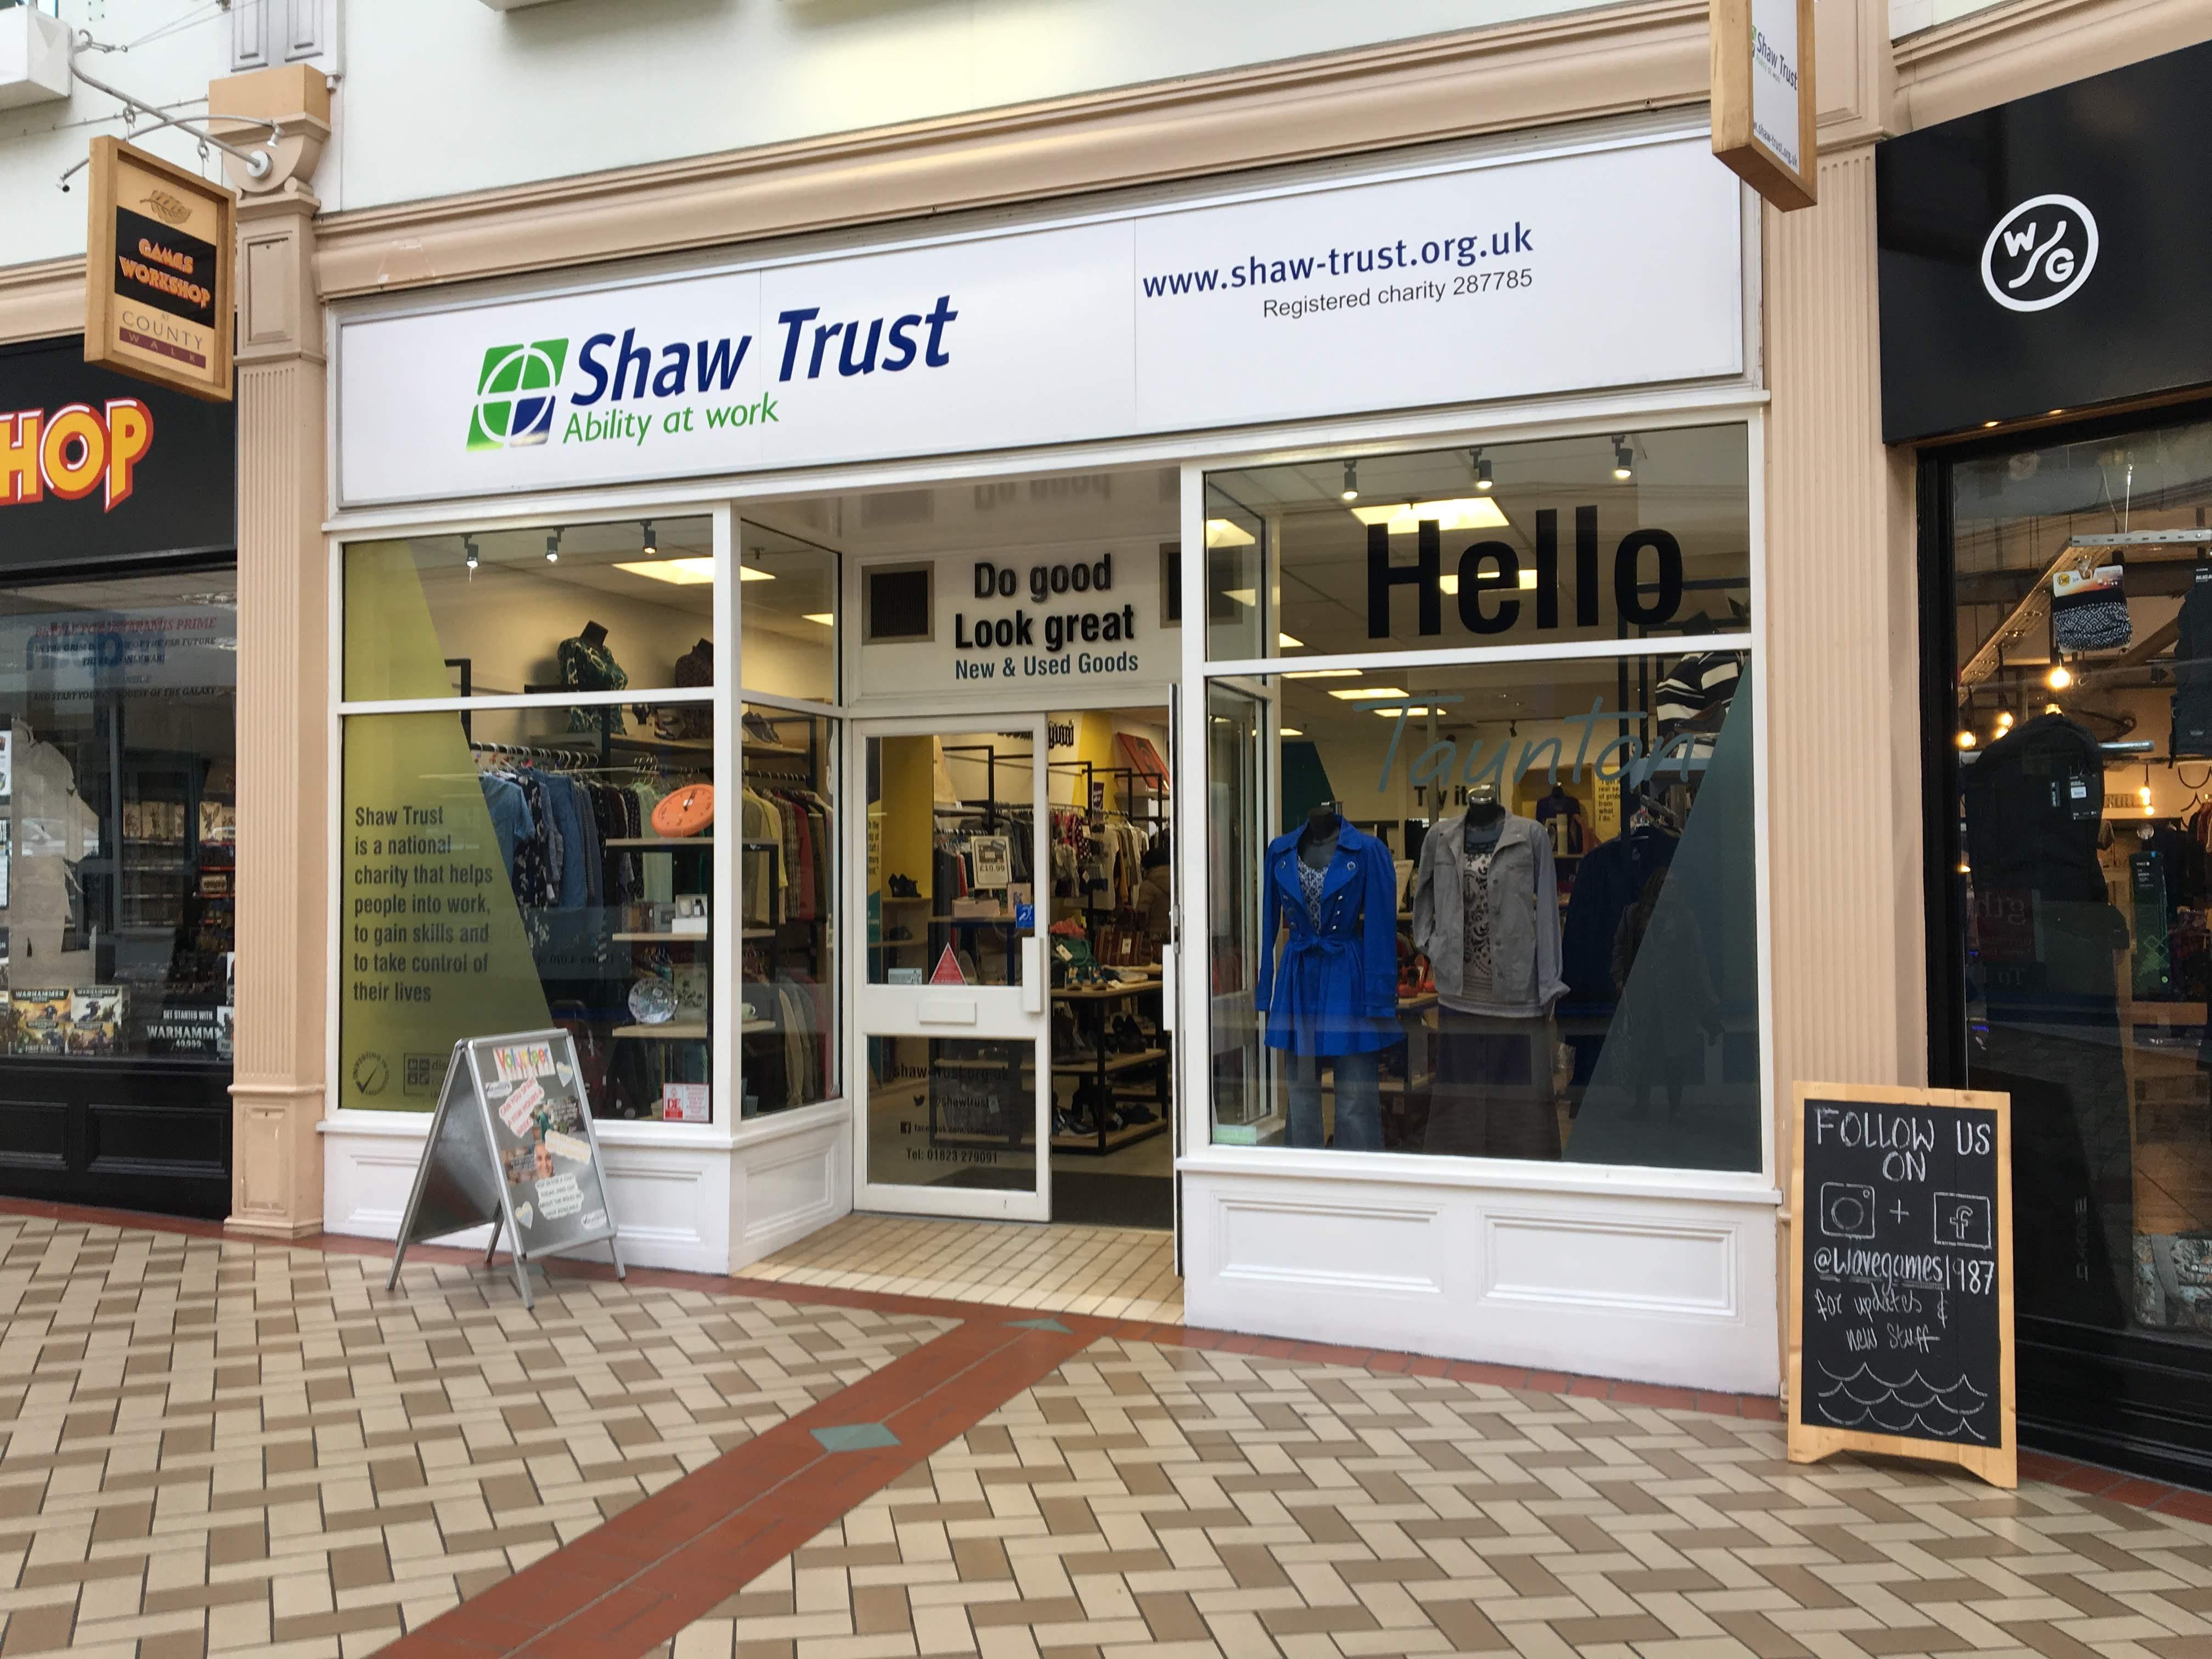 Shaw Trust - Charity shop - Taunton - Taunton, Somerset TA1 3TZ - 01823 279091 | ShowMeLocal.com